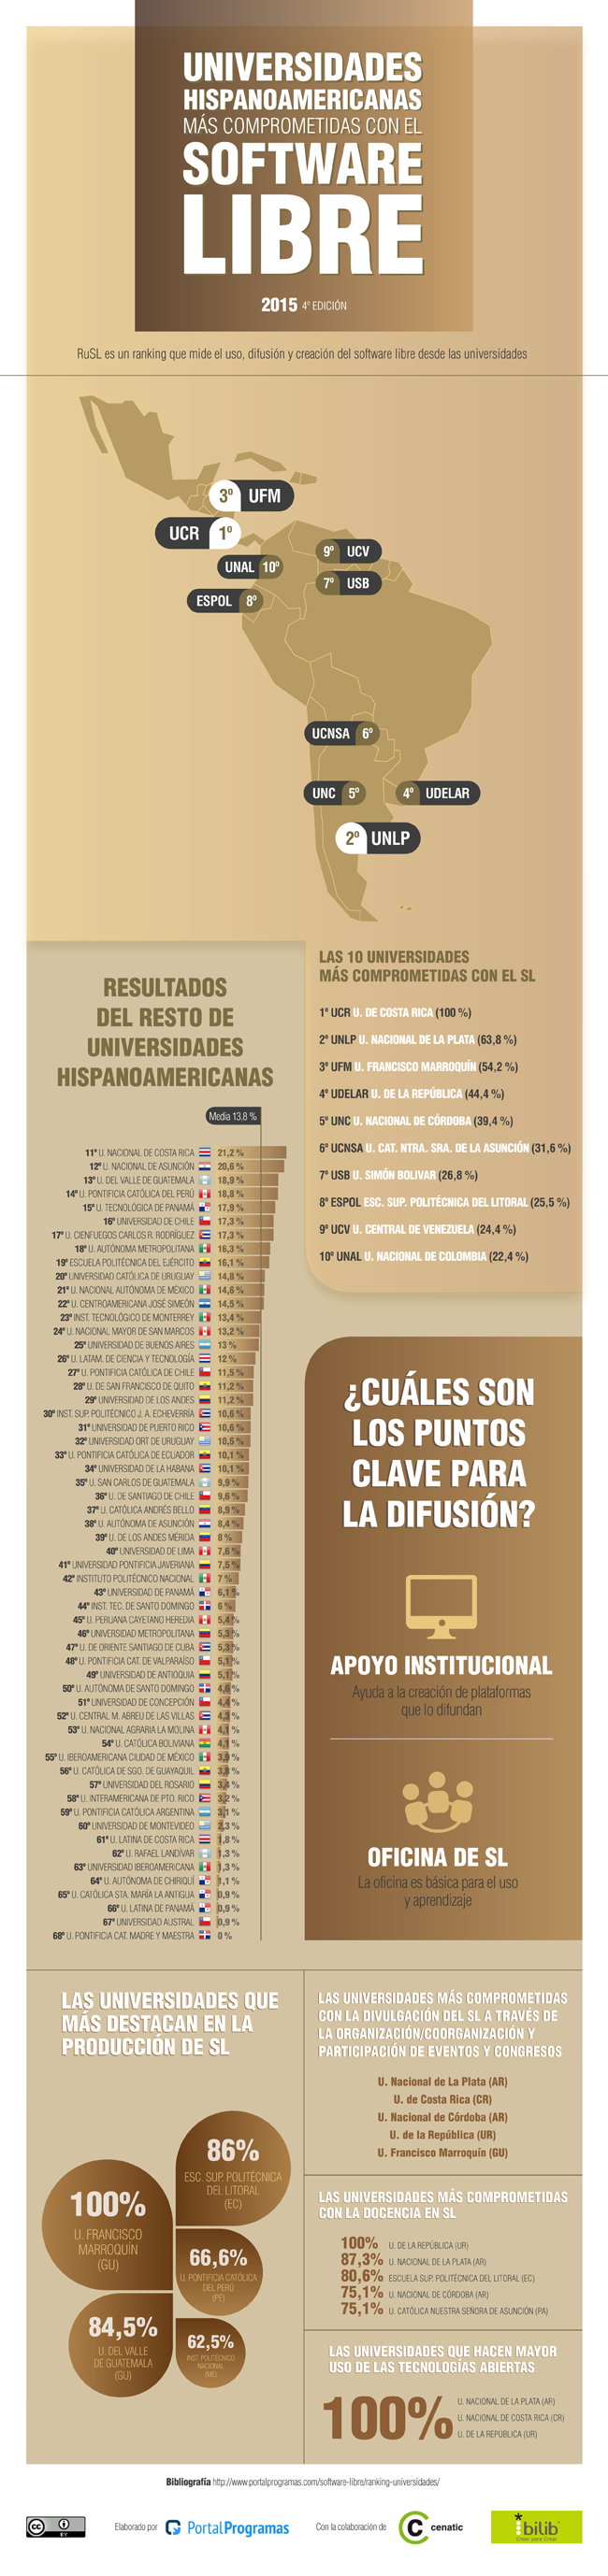 Mejores Universidades Hispanoamericanas Software Libre